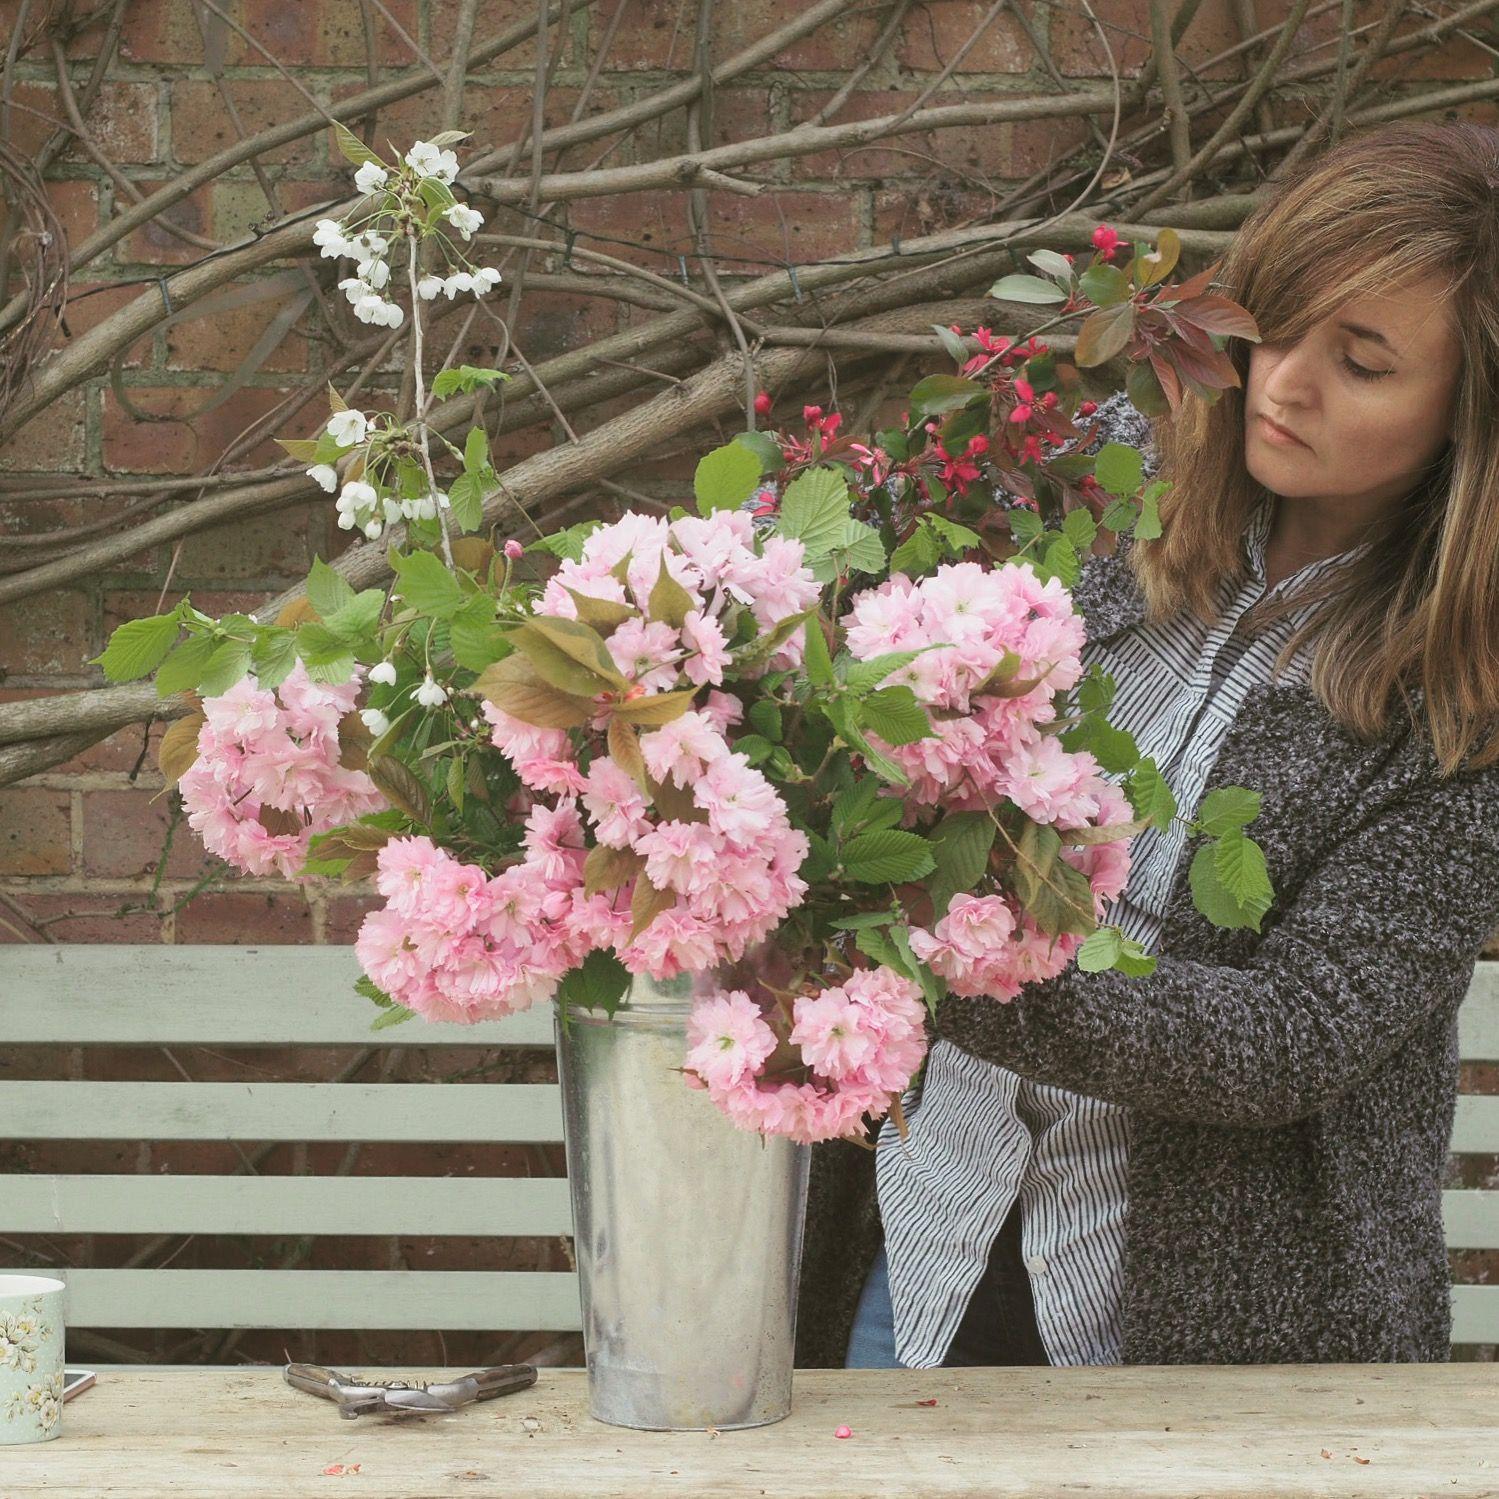 Popup flower stall. British flowers, Seasonal flowers